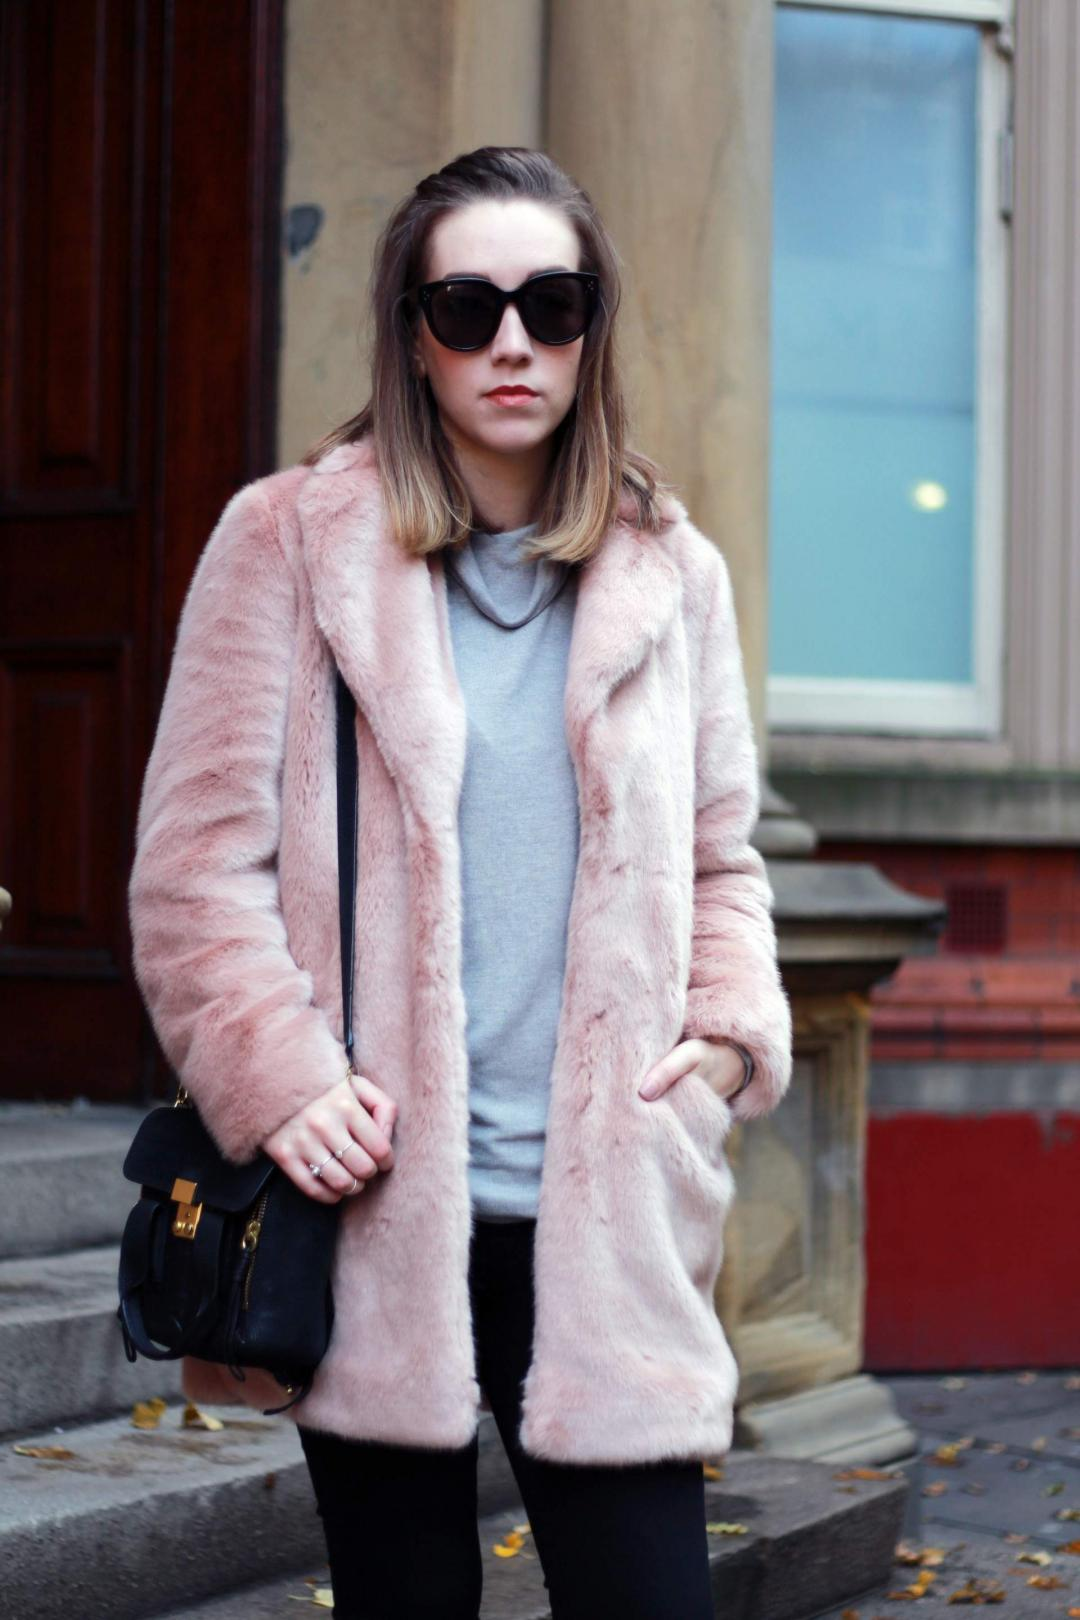 reiss-alba-pink-faux-fur-coat-phillip-lim-pashli-isabel-marant-dicker-boots-street-style-3